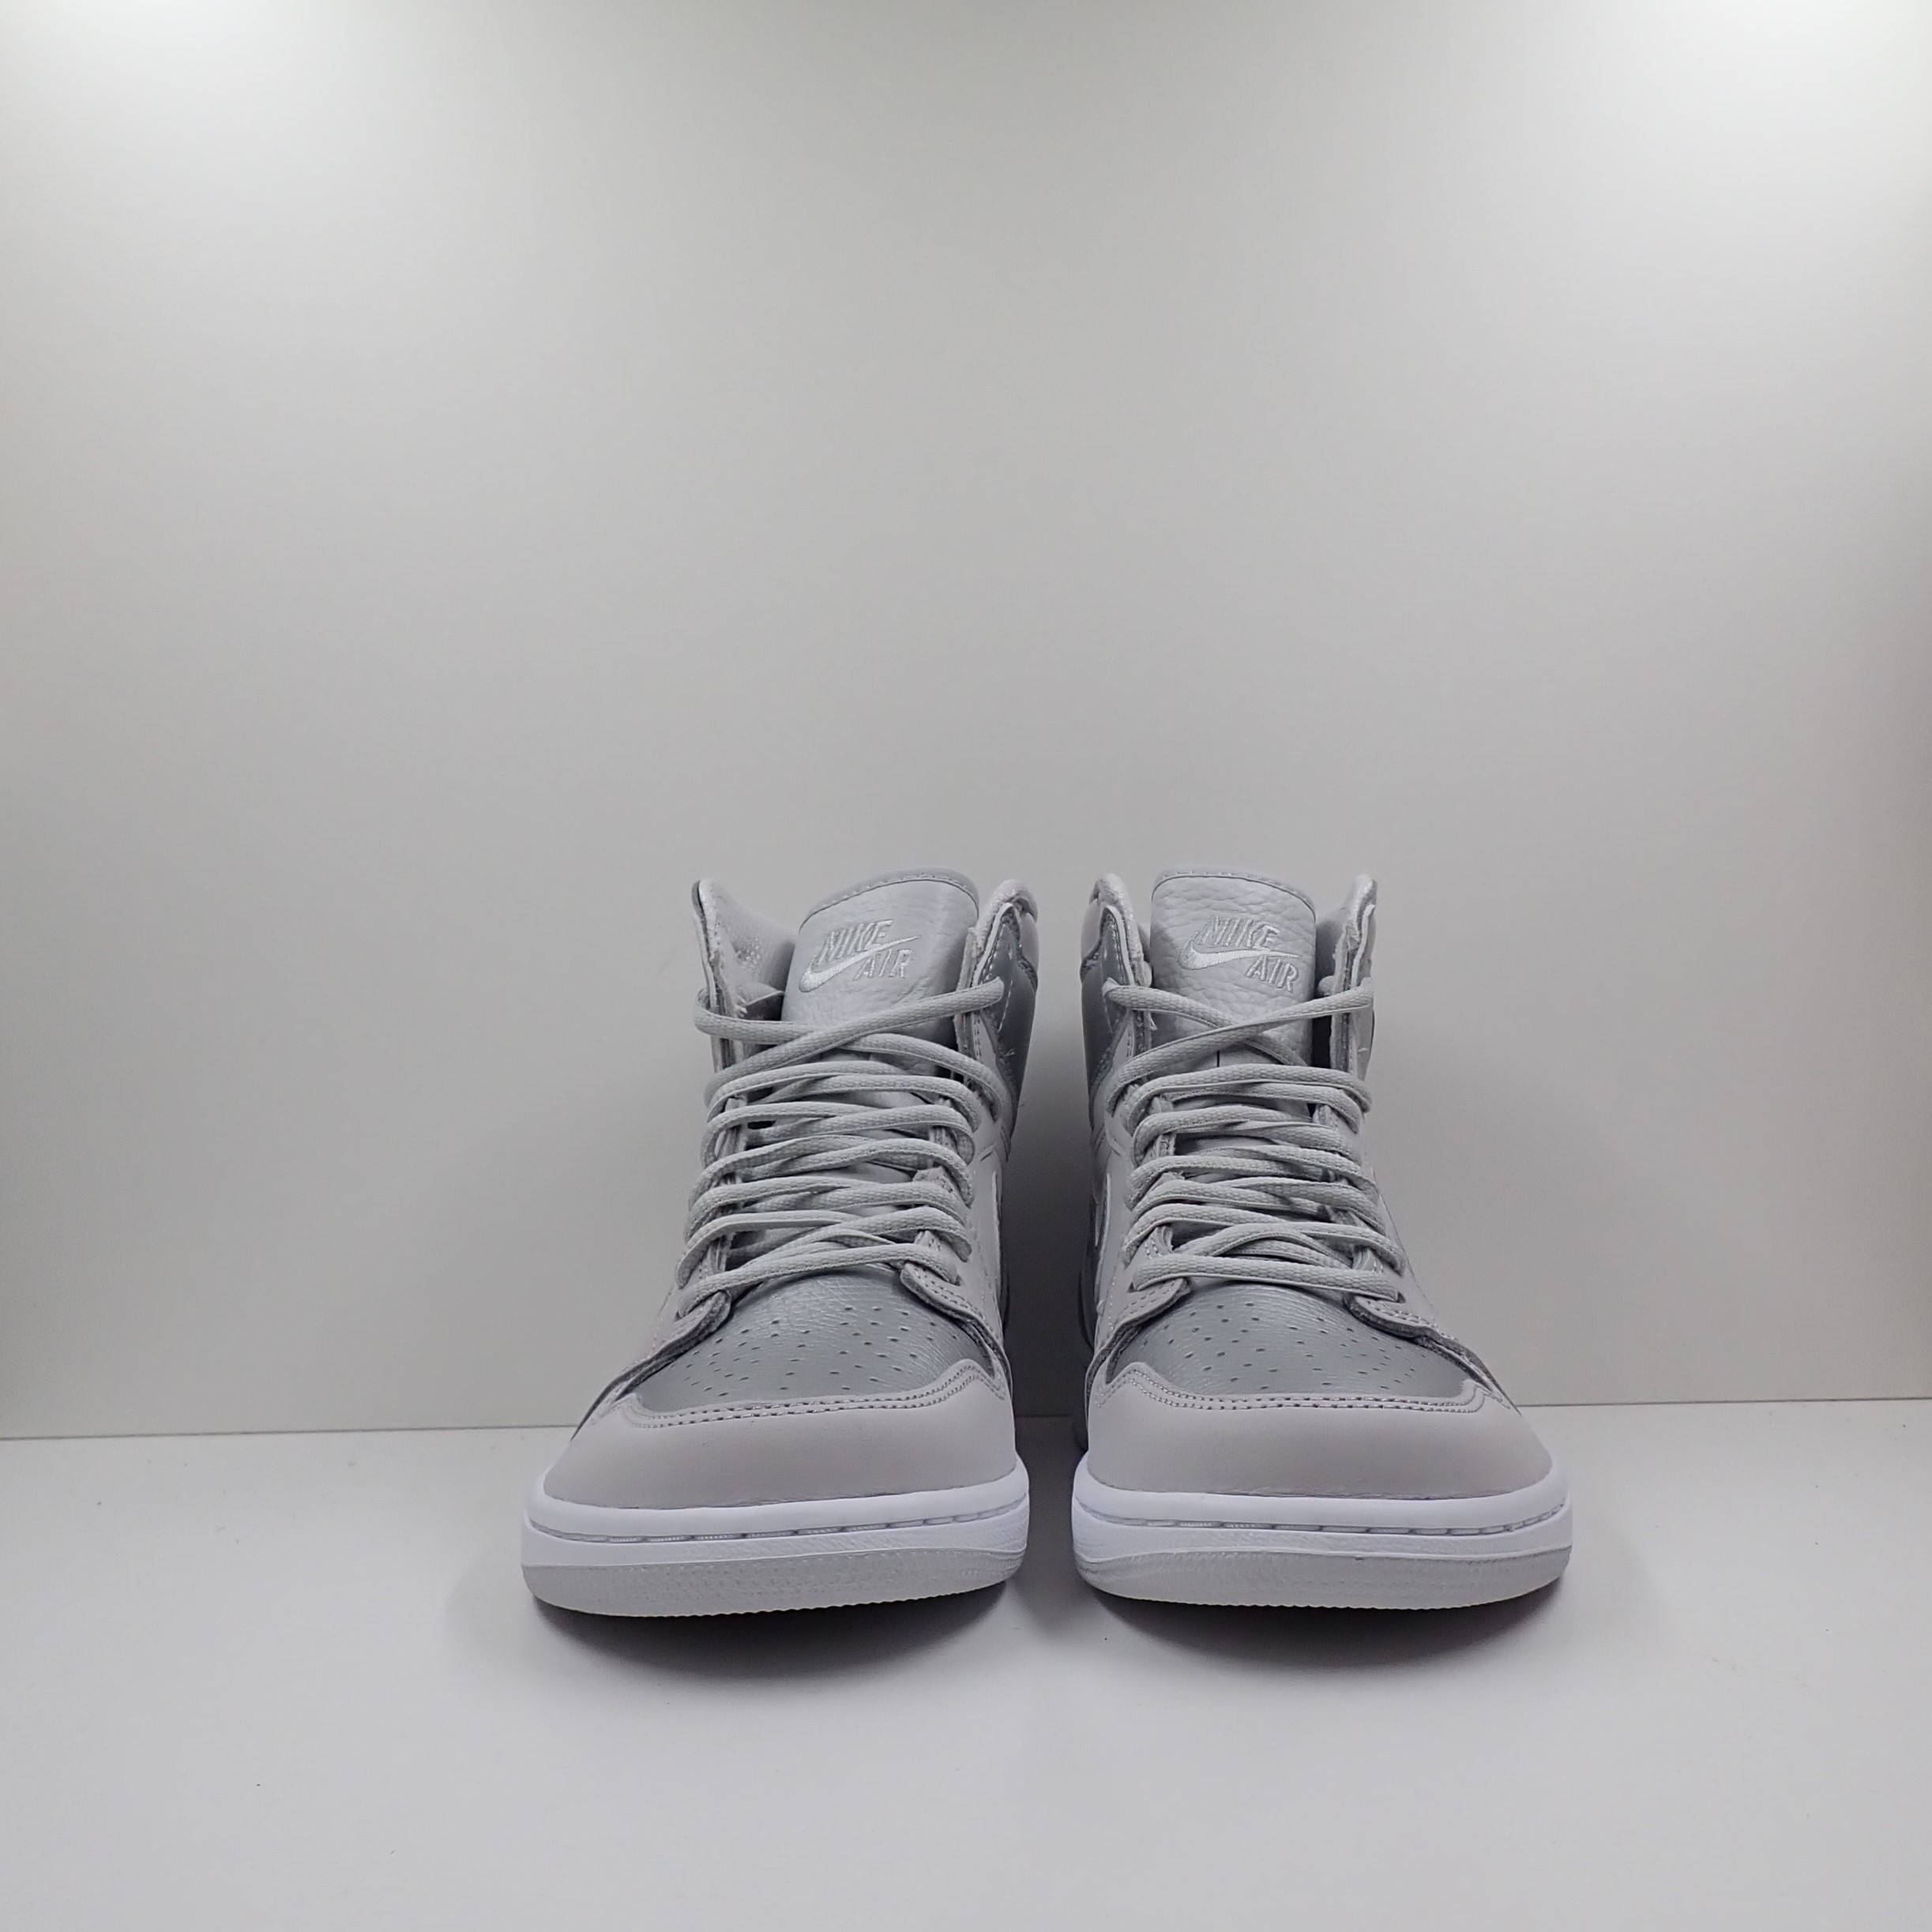 Jordan 1 Retro High CO Japan Neutral Grey (2020)